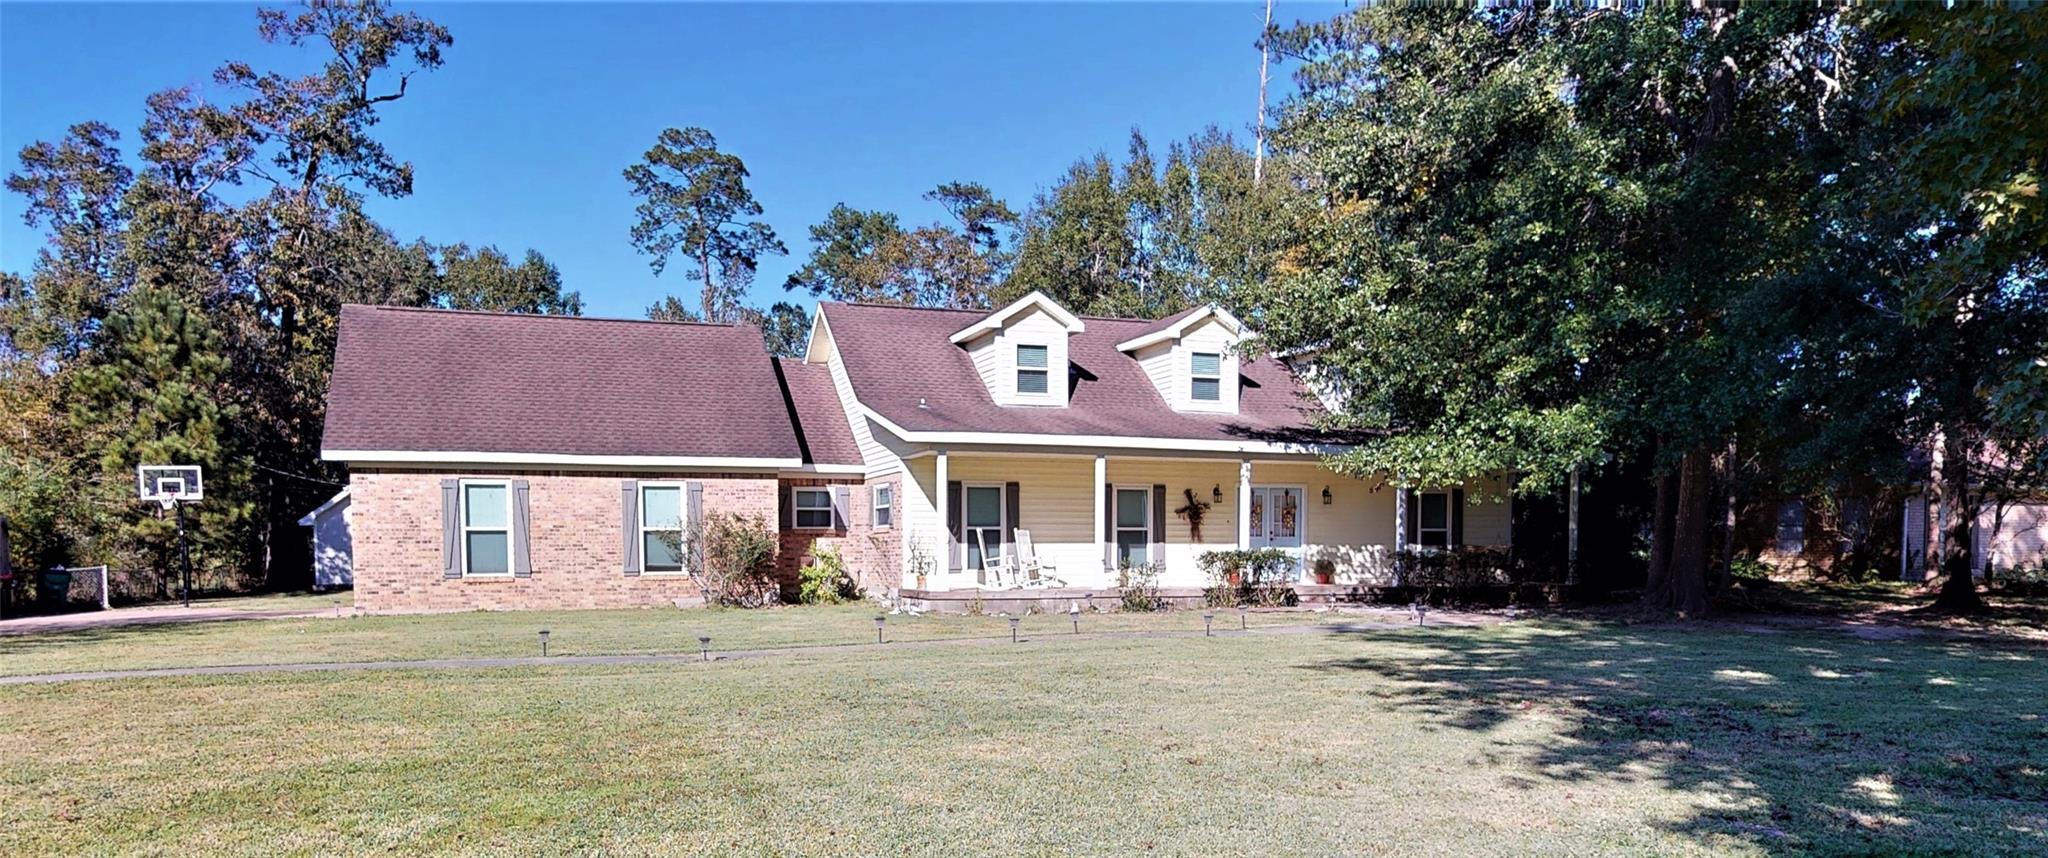 446 Piney Point Dr Drive Property Photo - Sour Lake, TX real estate listing